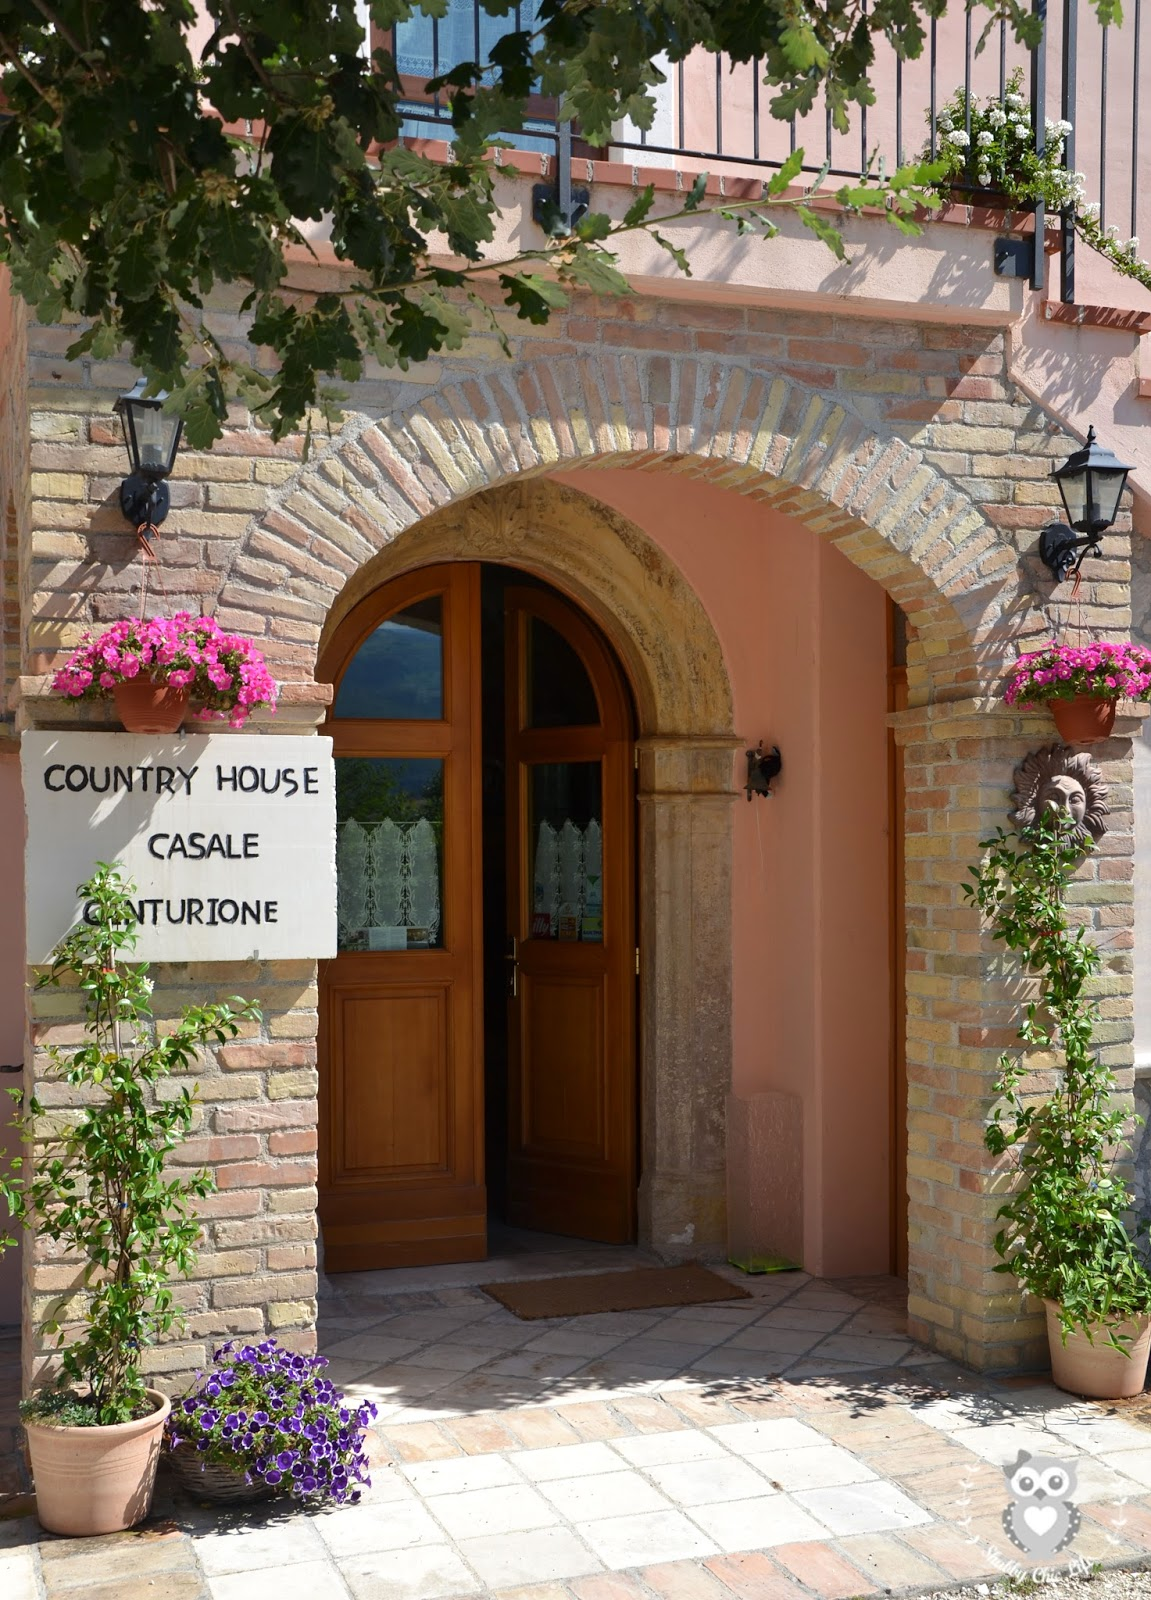 Country House Casale Centurione, Manoppello